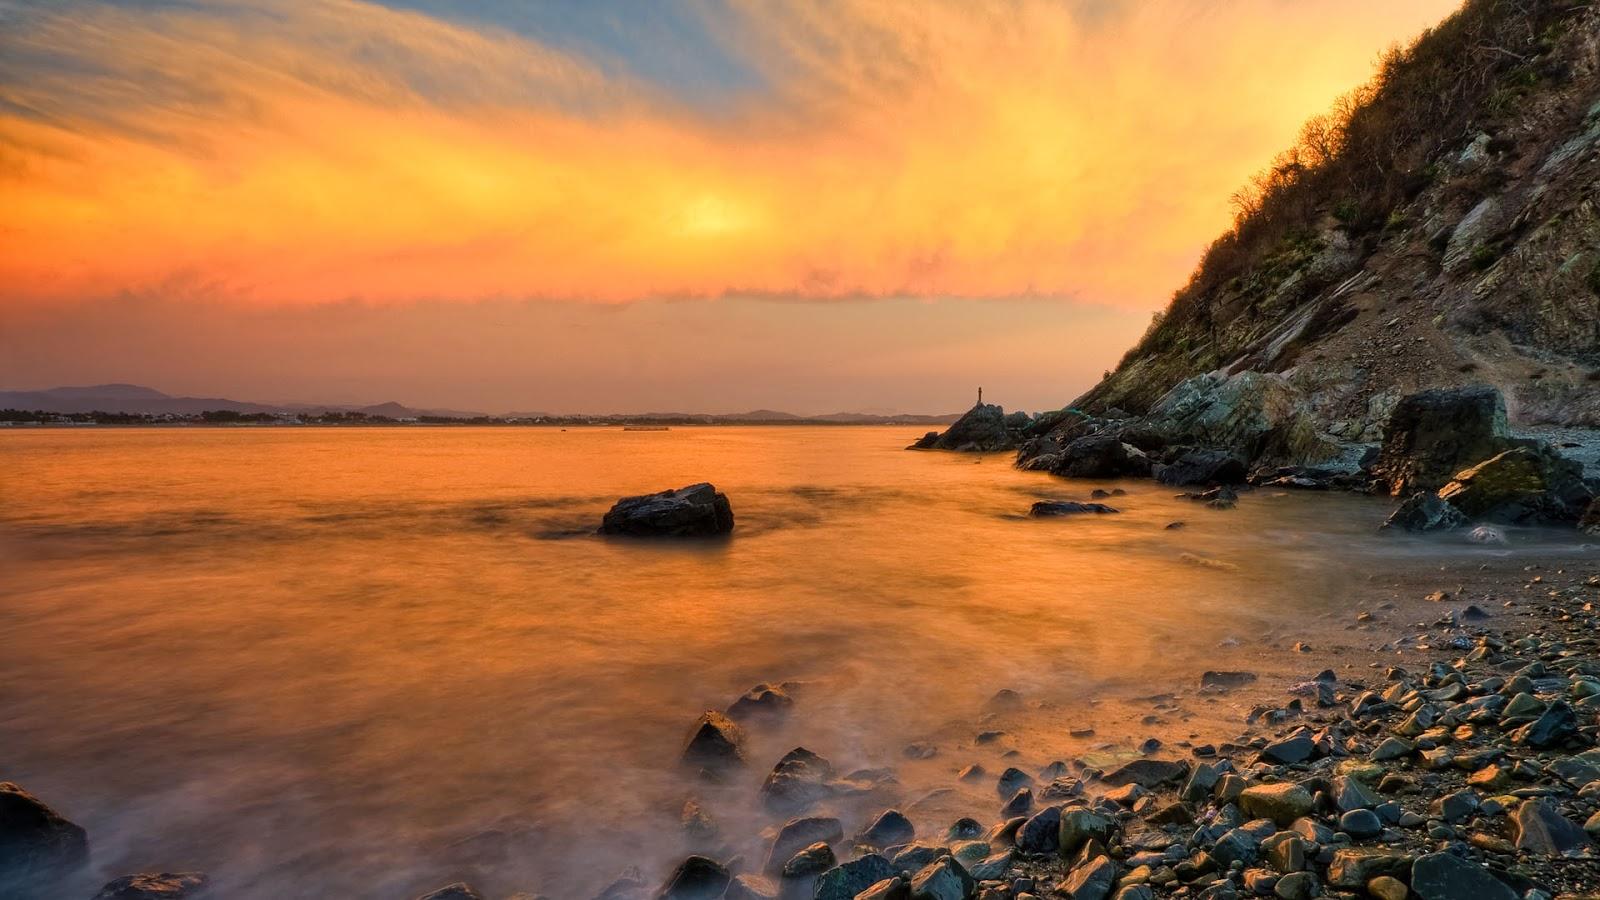 10 Top Sunny Beach Wallpaper Hd Full Hd 1920 1080 For Pc: HD WALLPAPERS: Download 1080p Wallpaper